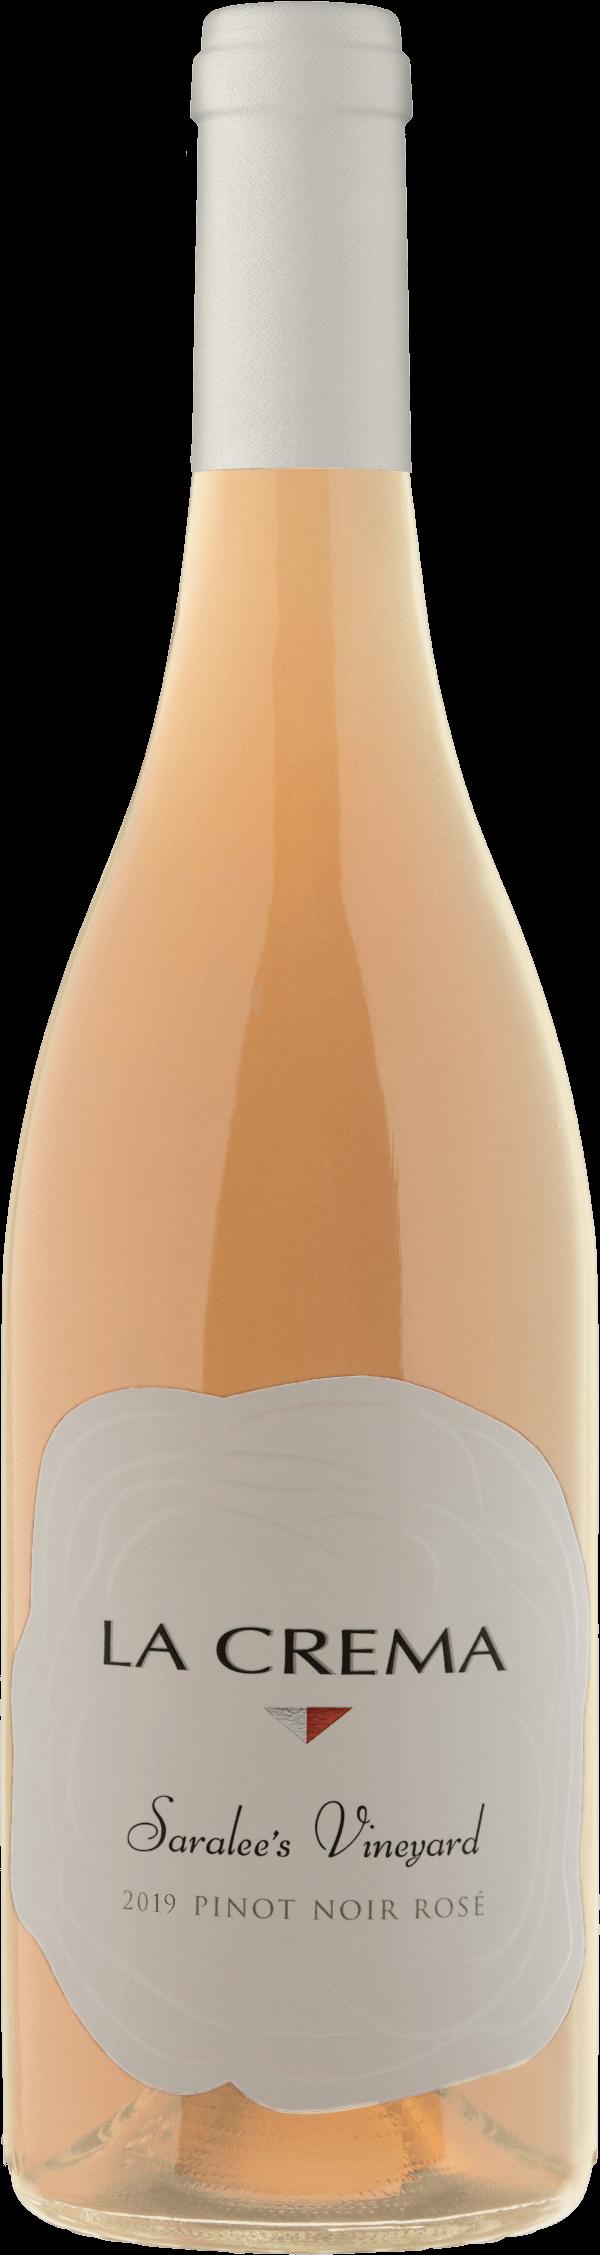 2019 Saralee's Vineyard Pinot Noir Rosé 1.5L